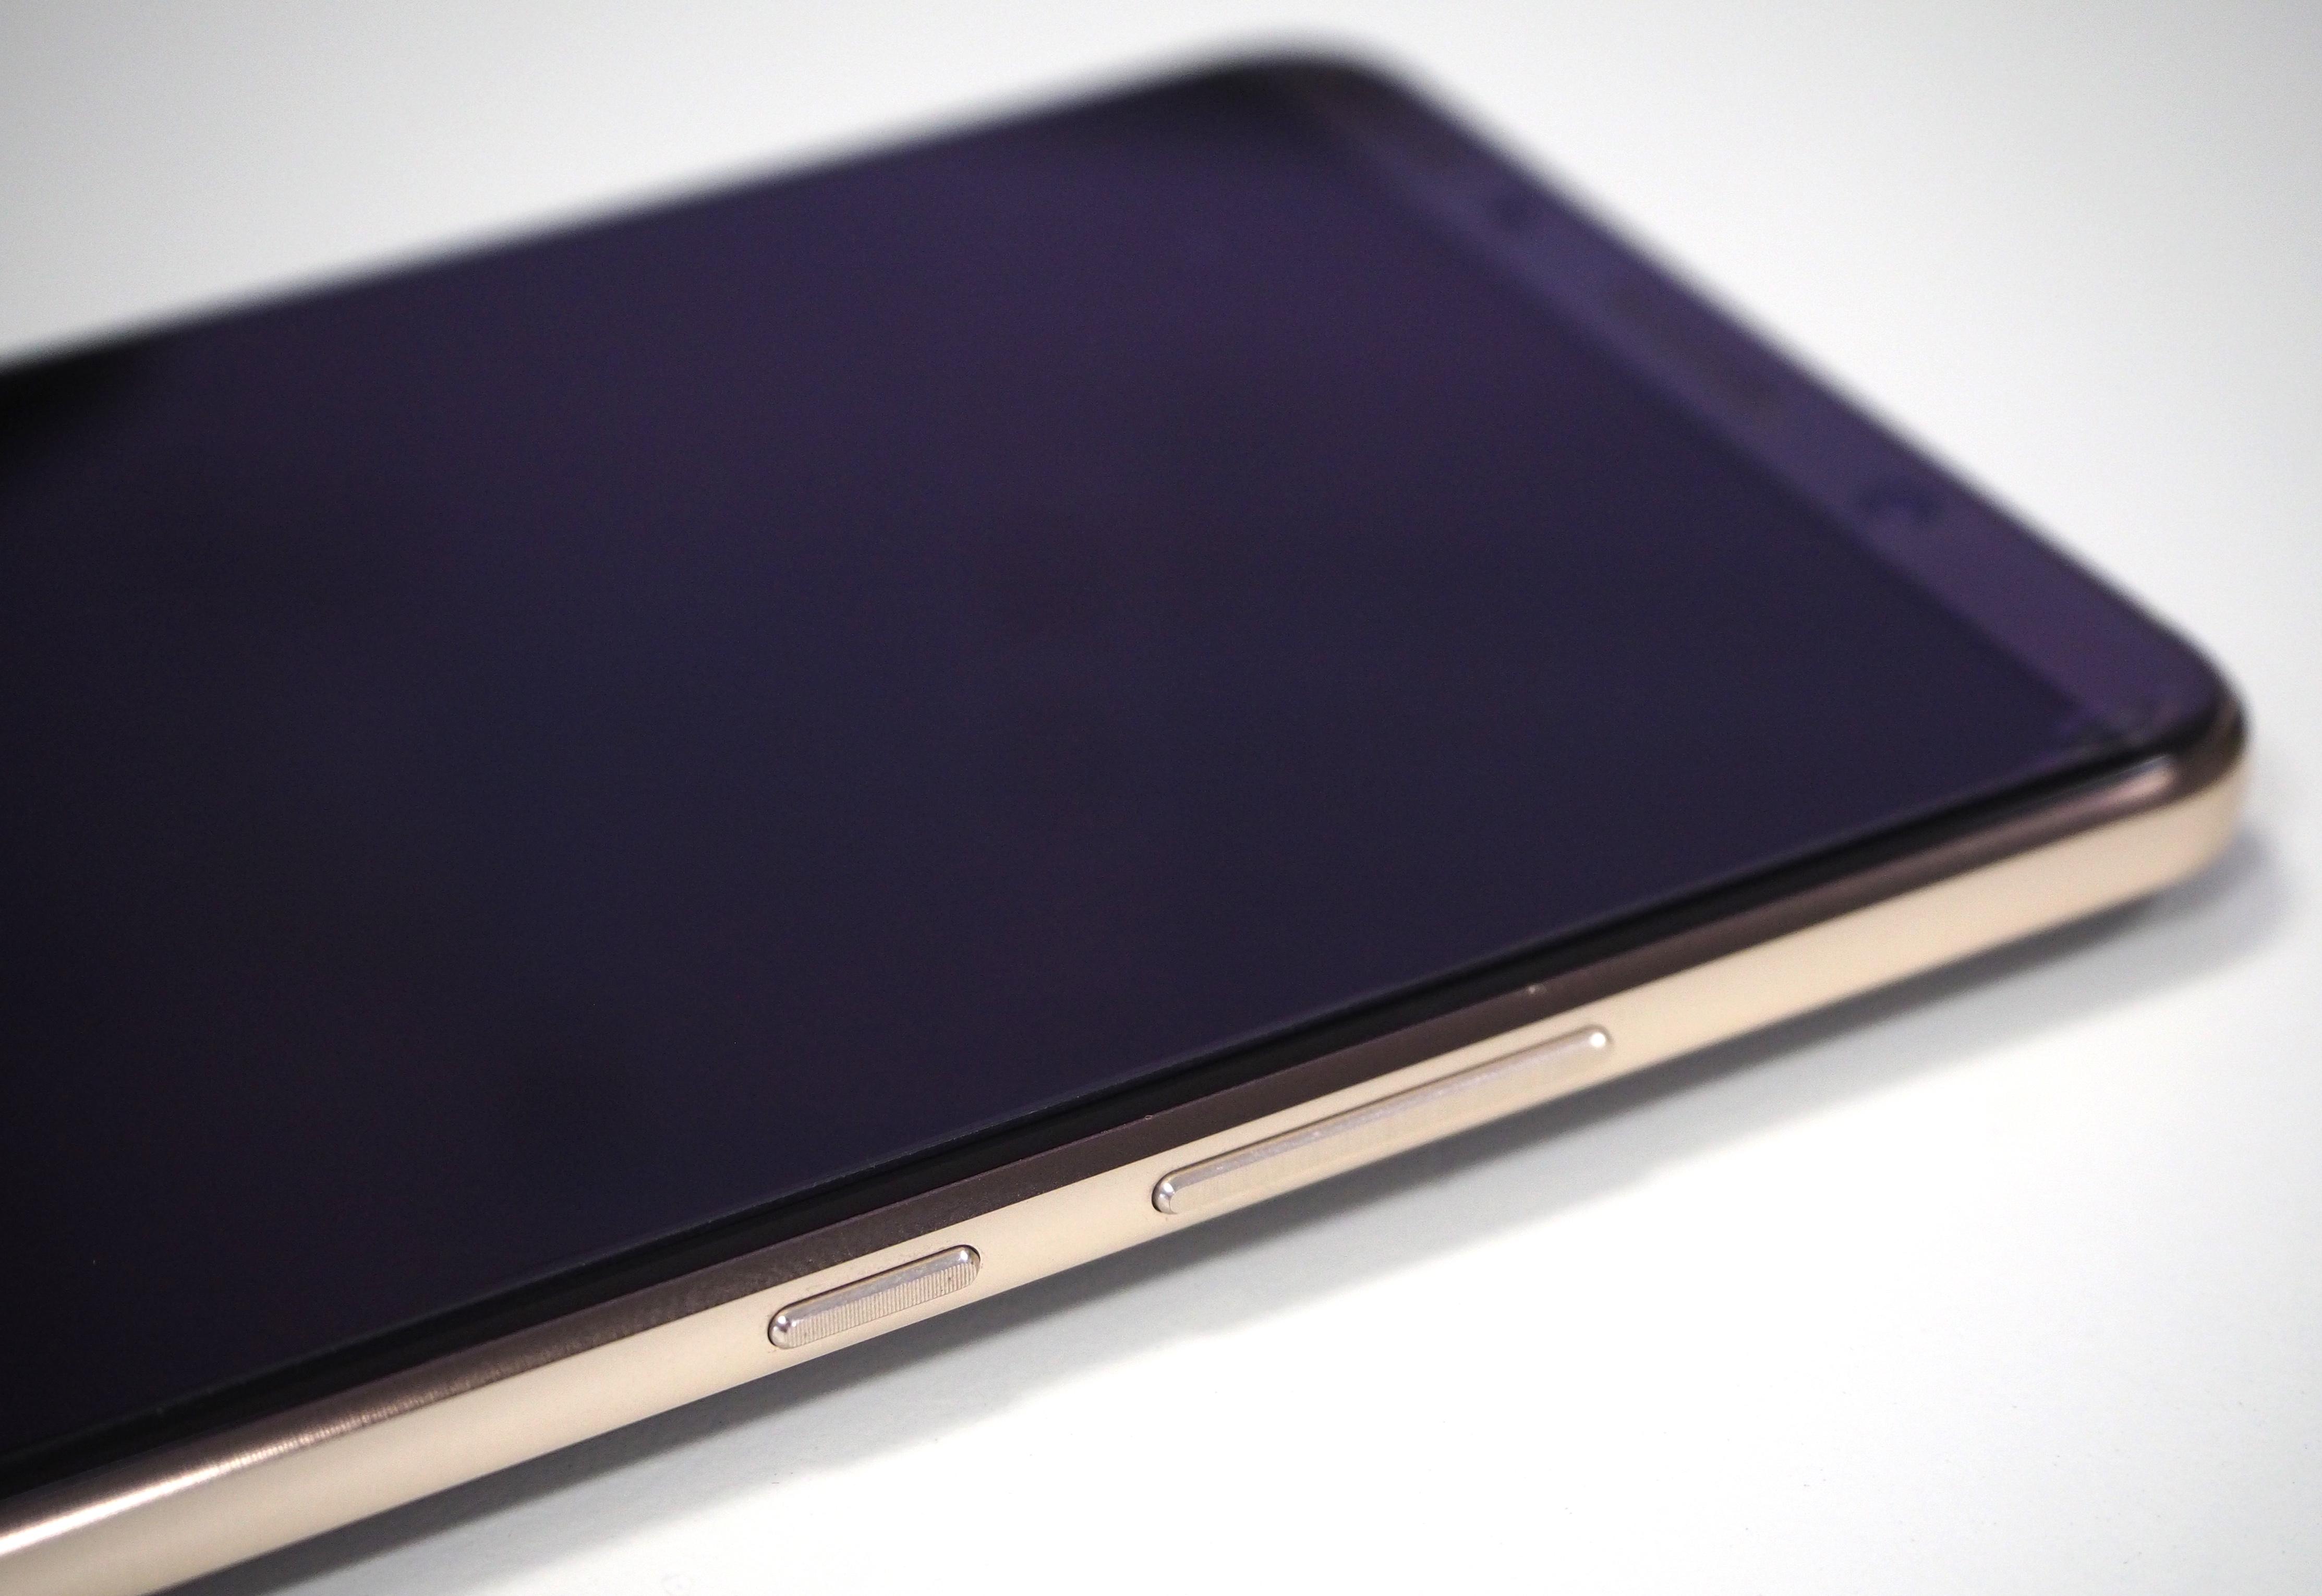 Huawei Mate 10 Pro Leica Dual Camera Review   ePHOTOzine